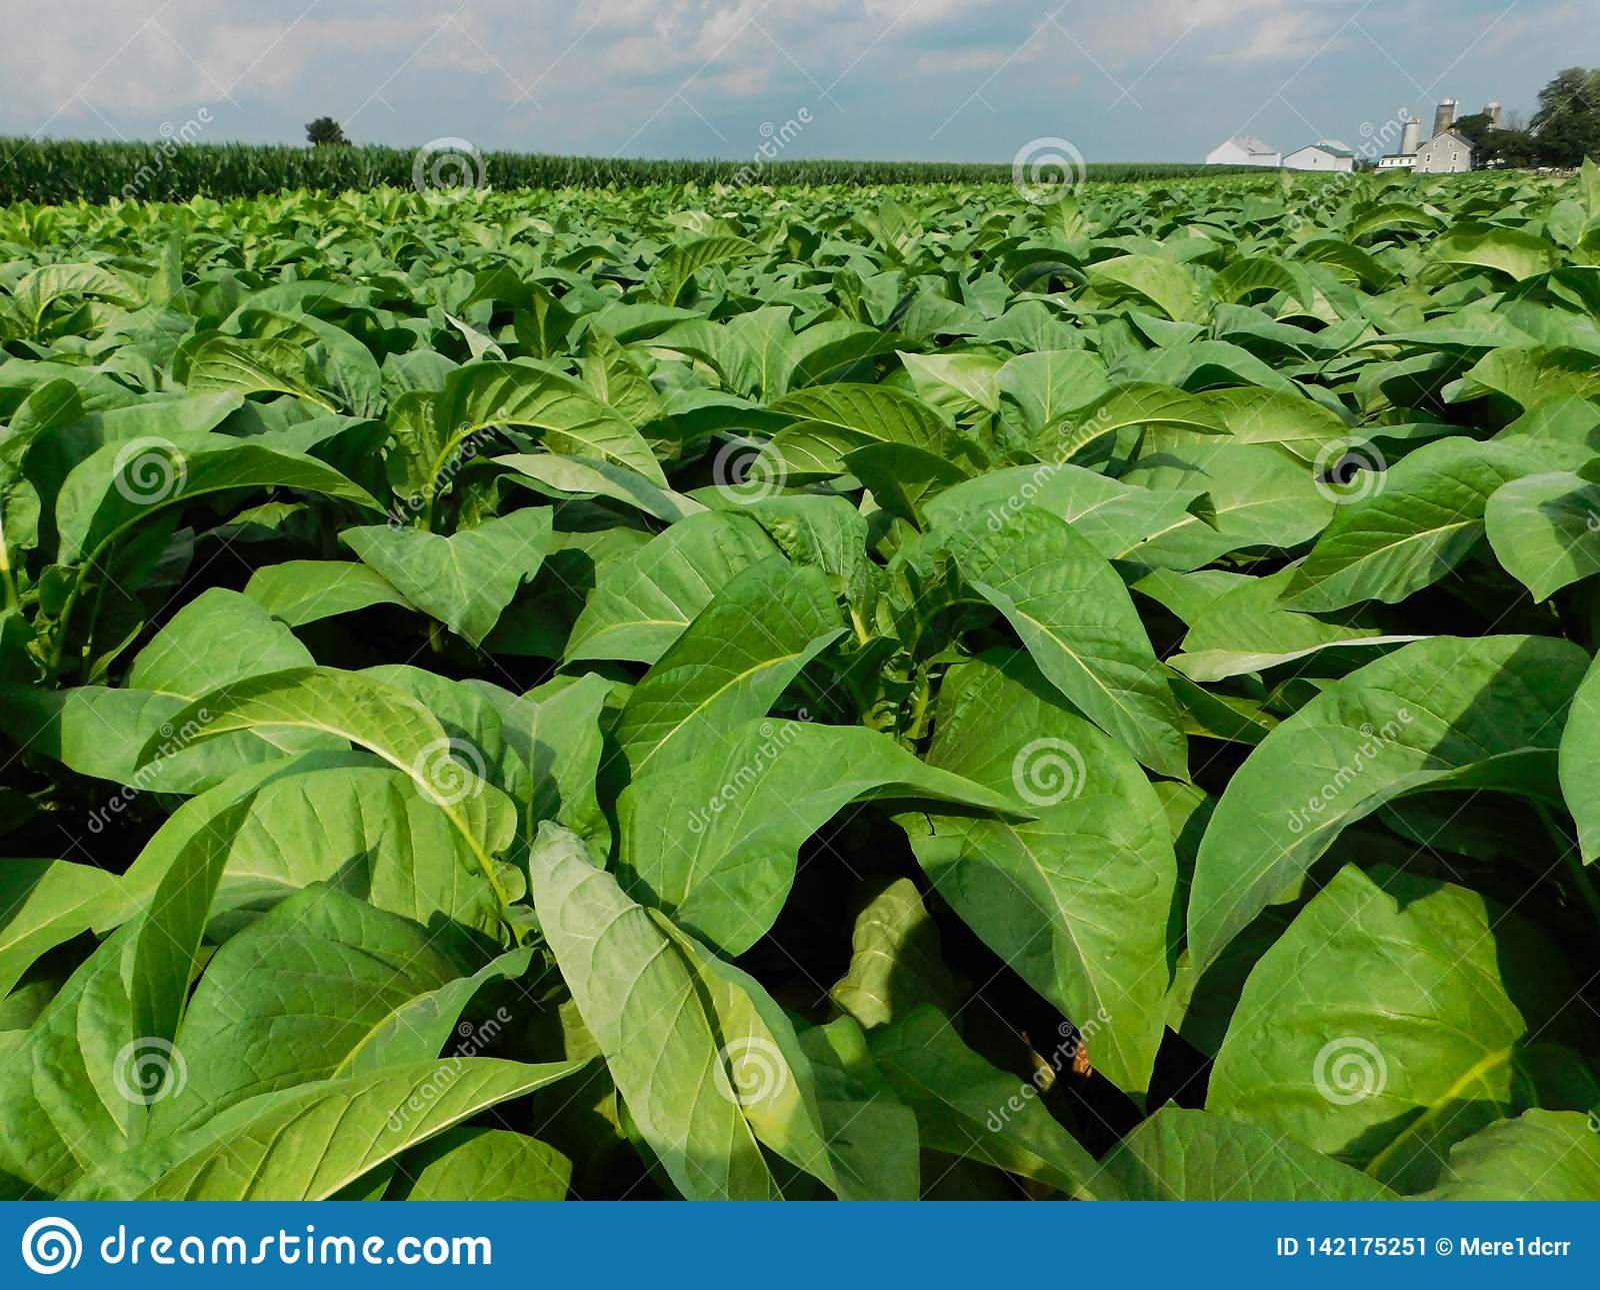 A tobacco field in daylight